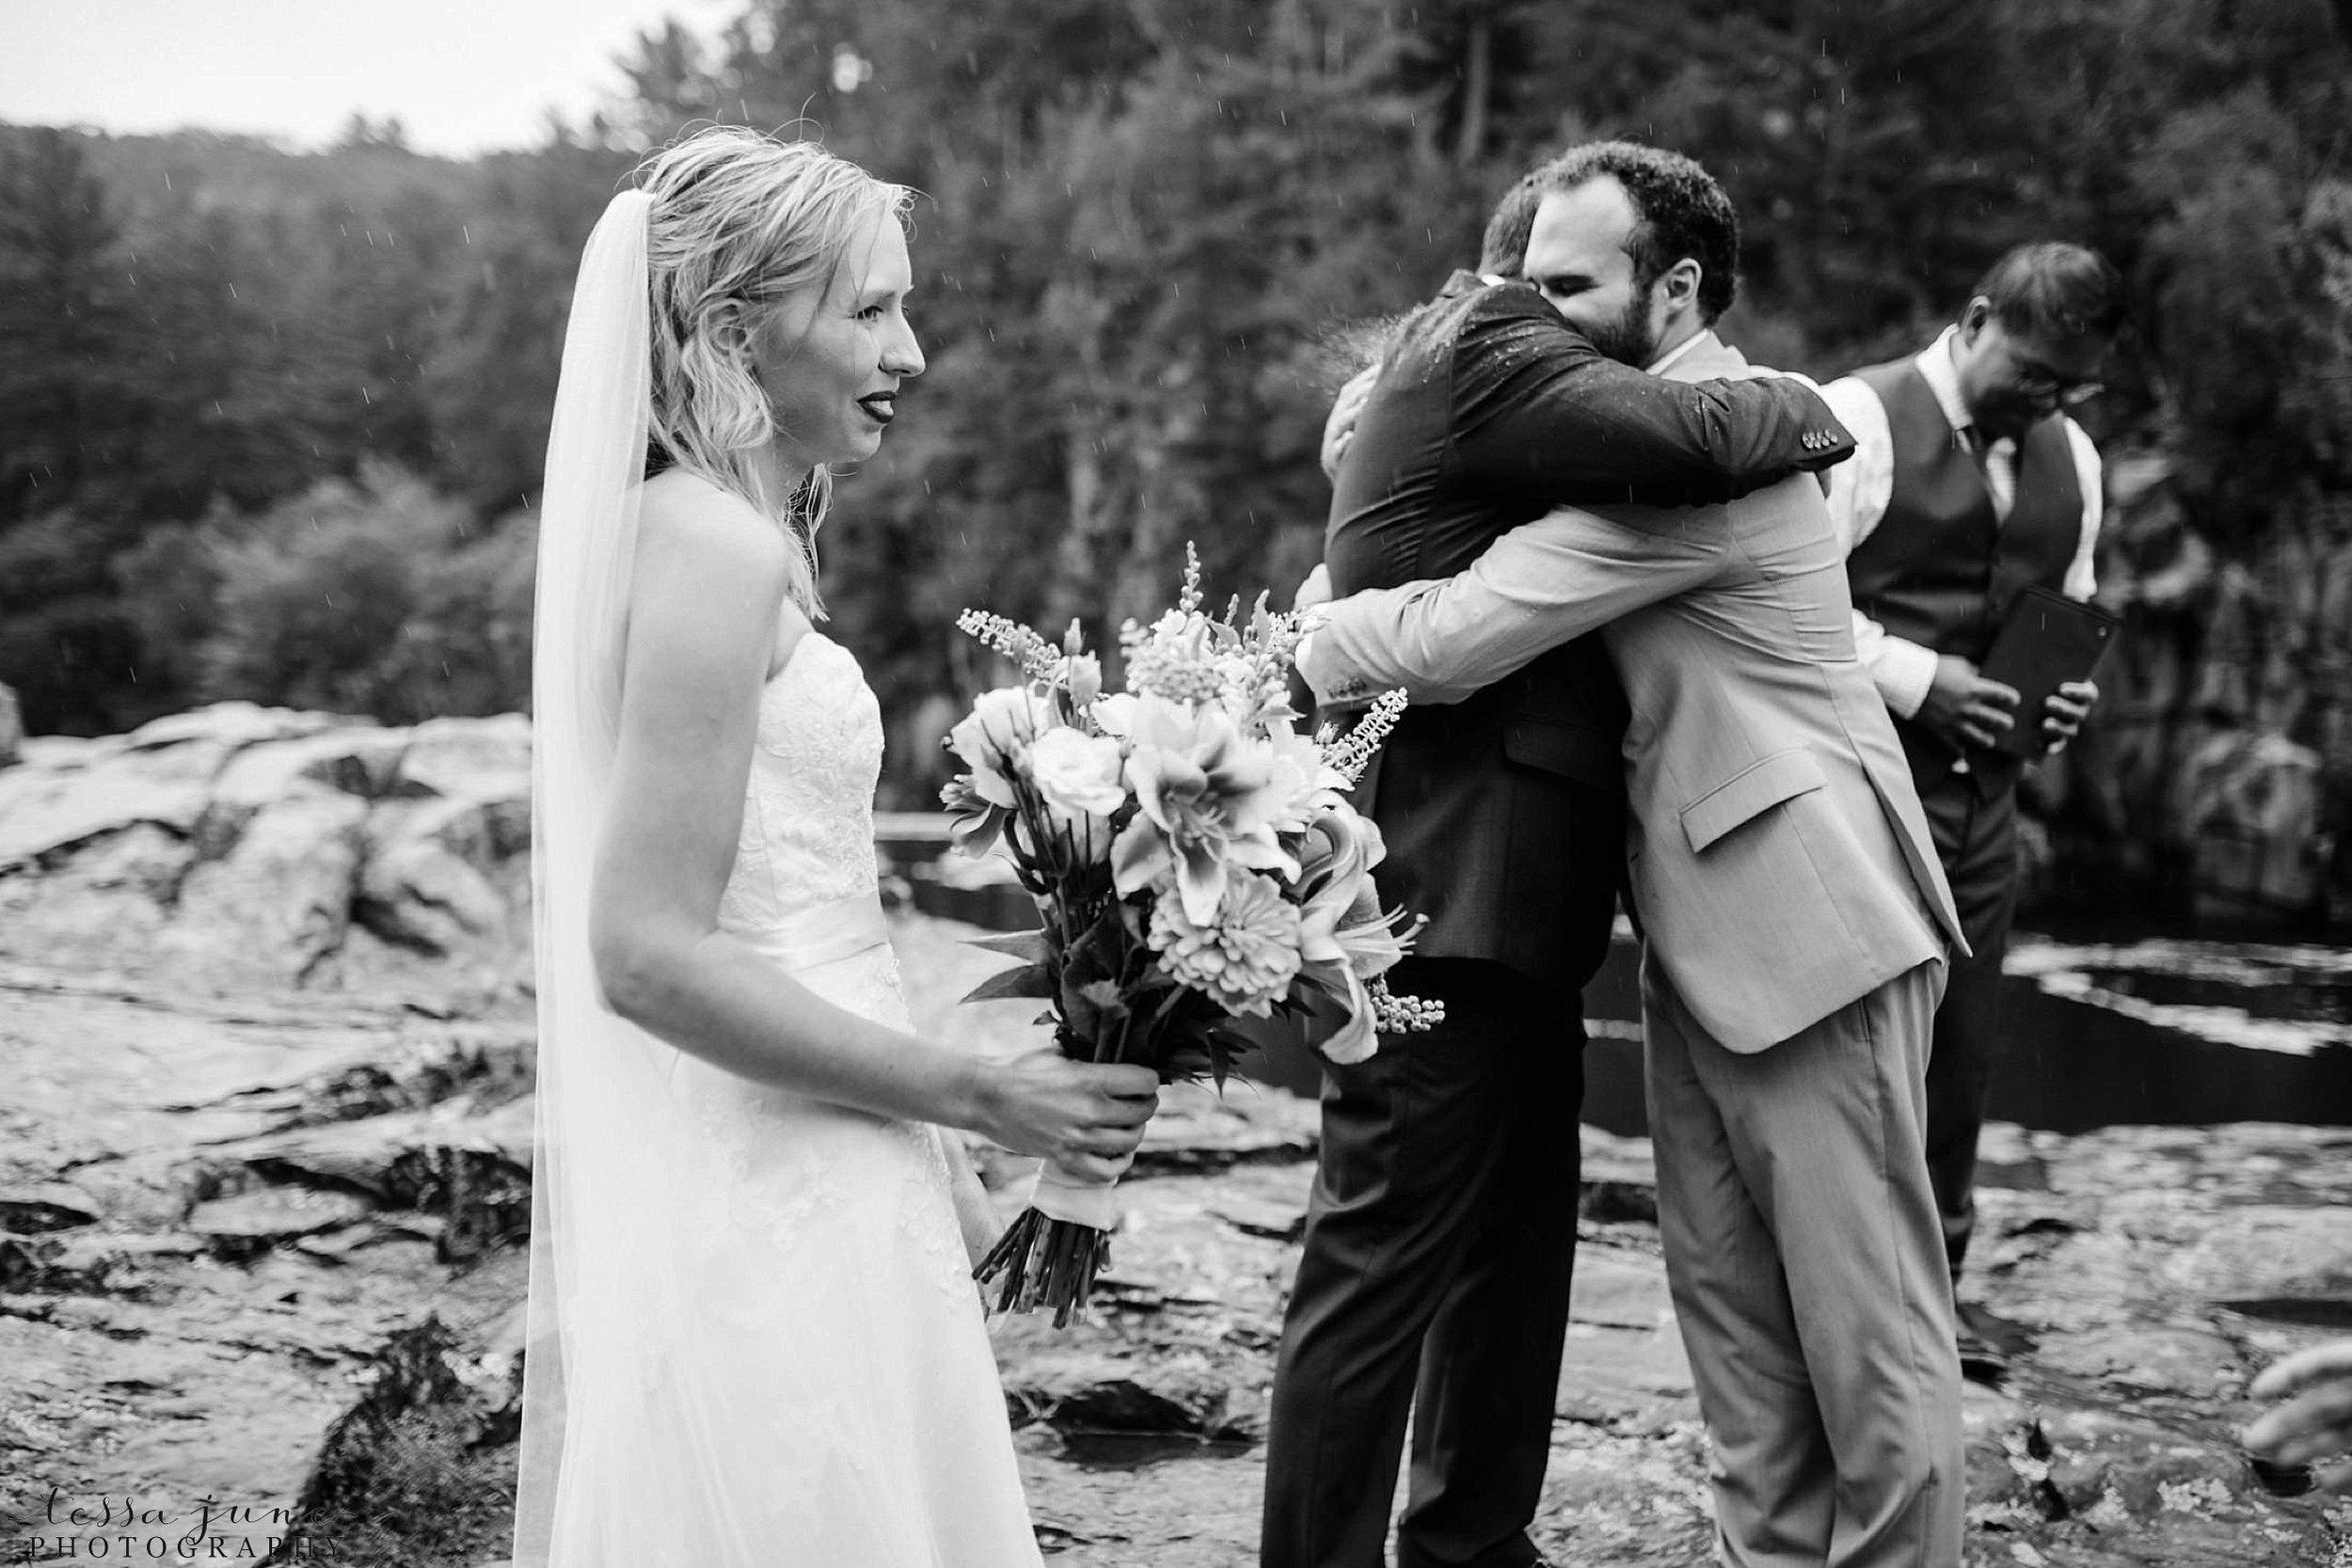 taylors-falls-rainy-elopement-wedding-interstate-state-park-46.jpg